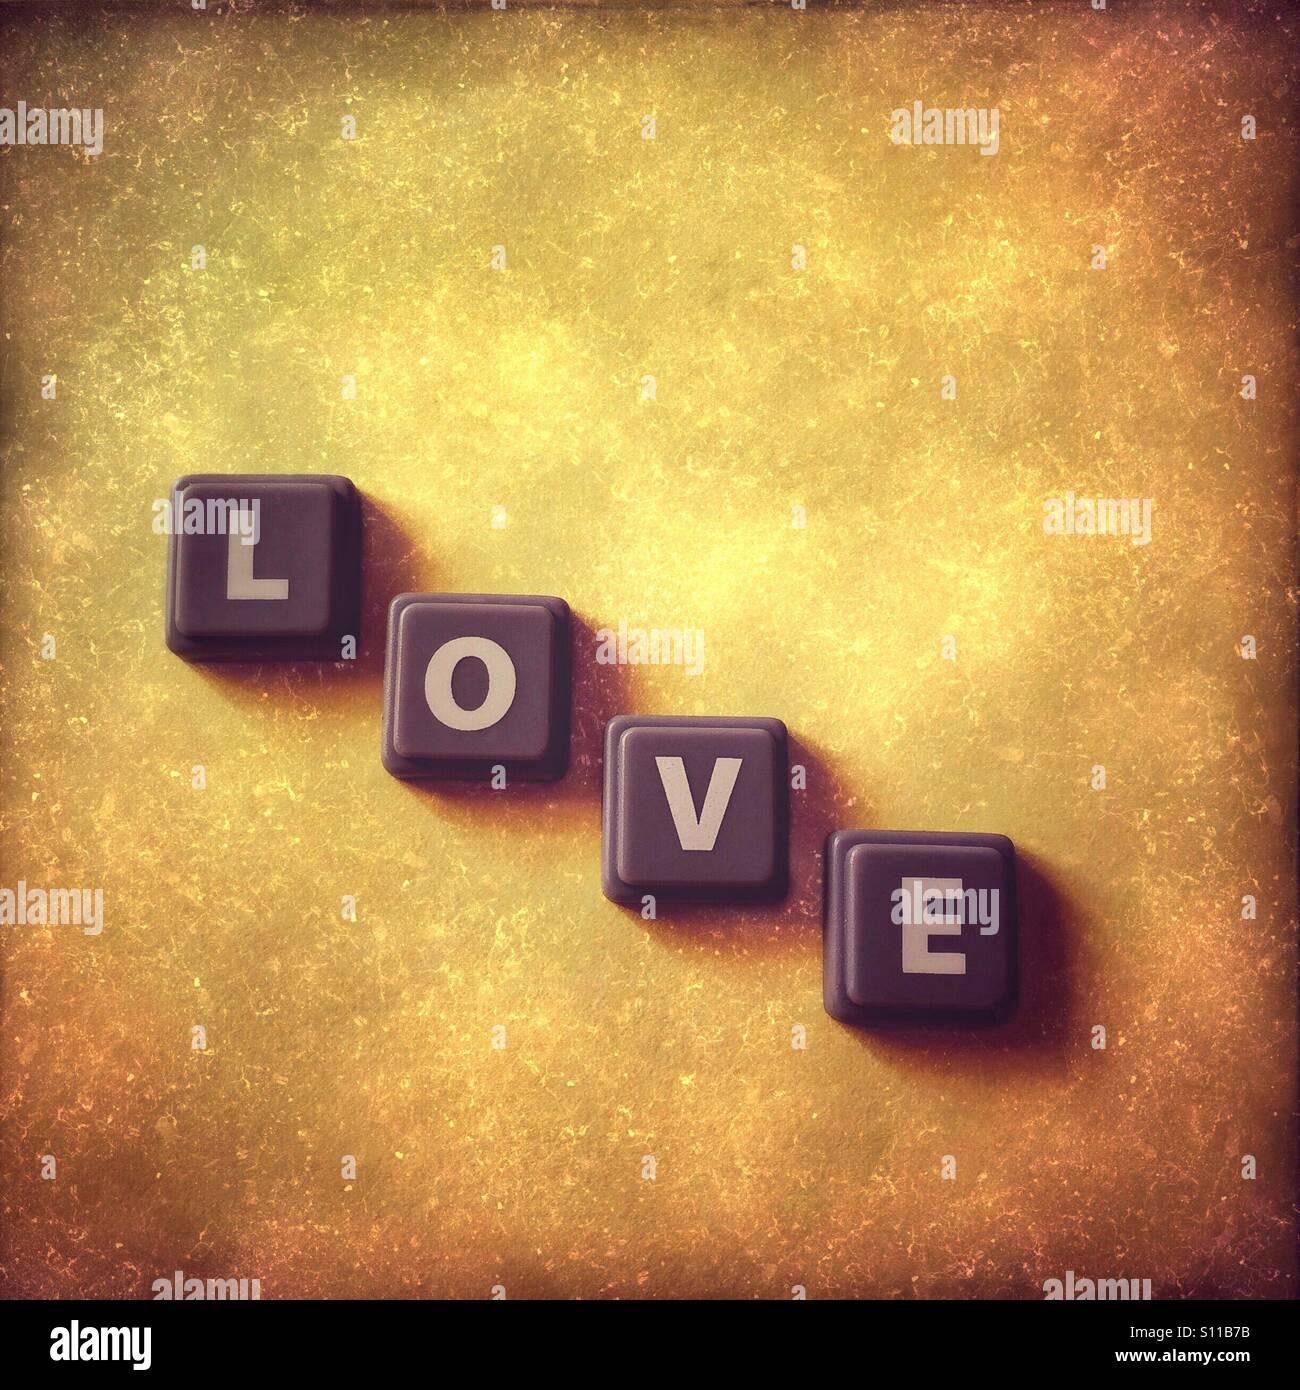 Palabra amor sobre fondo amarillo sucio Imagen De Stock